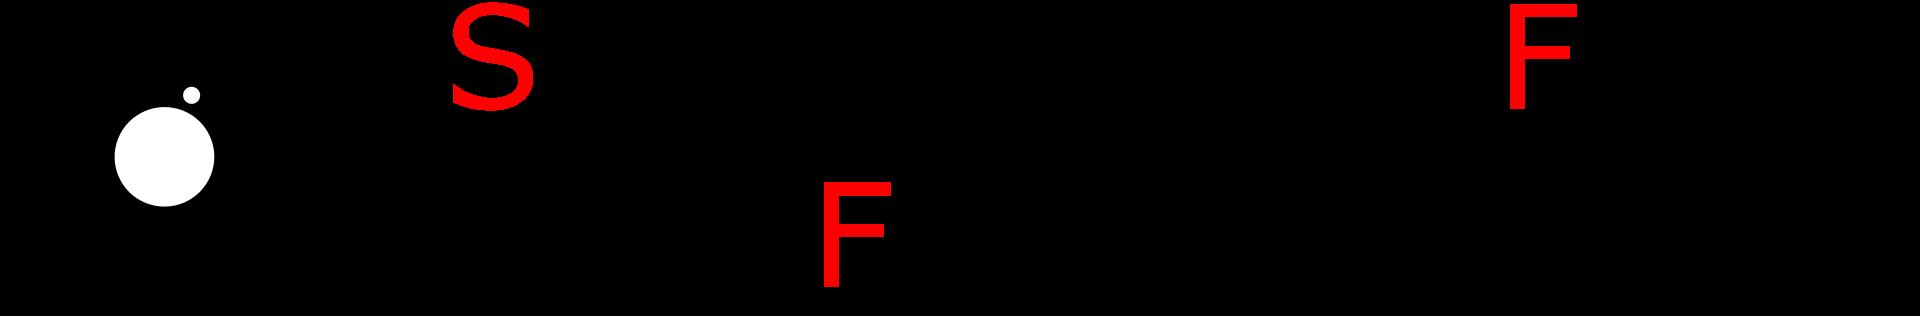 Logo Starnberger Film- und Fotogilde e.V. responsive